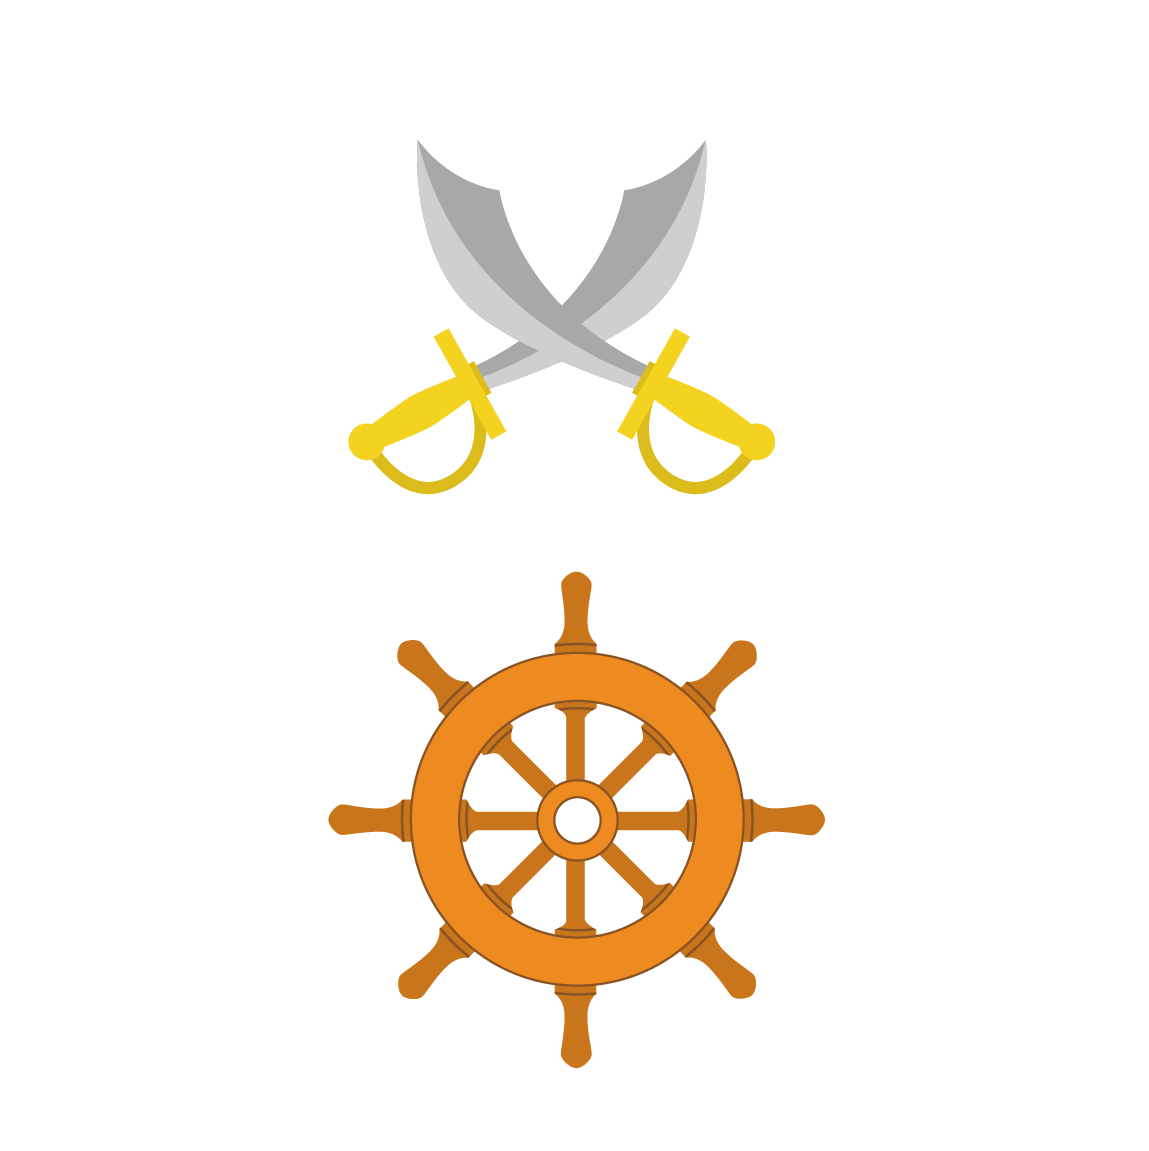 Wheel clipart pirate boat. Ships clip art transprent